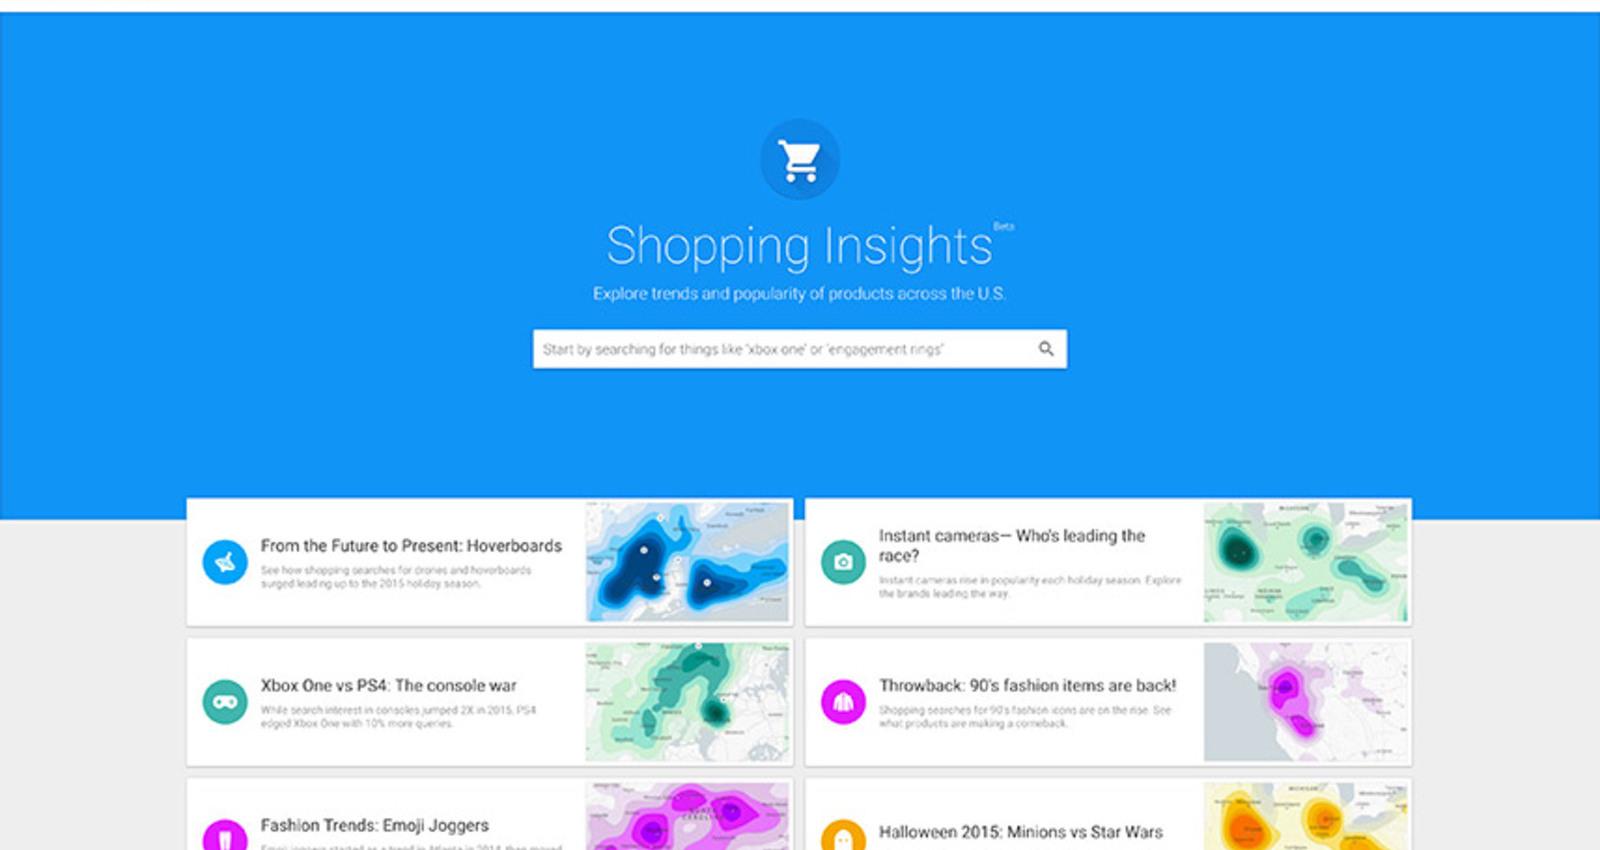 Google Shopping Insights